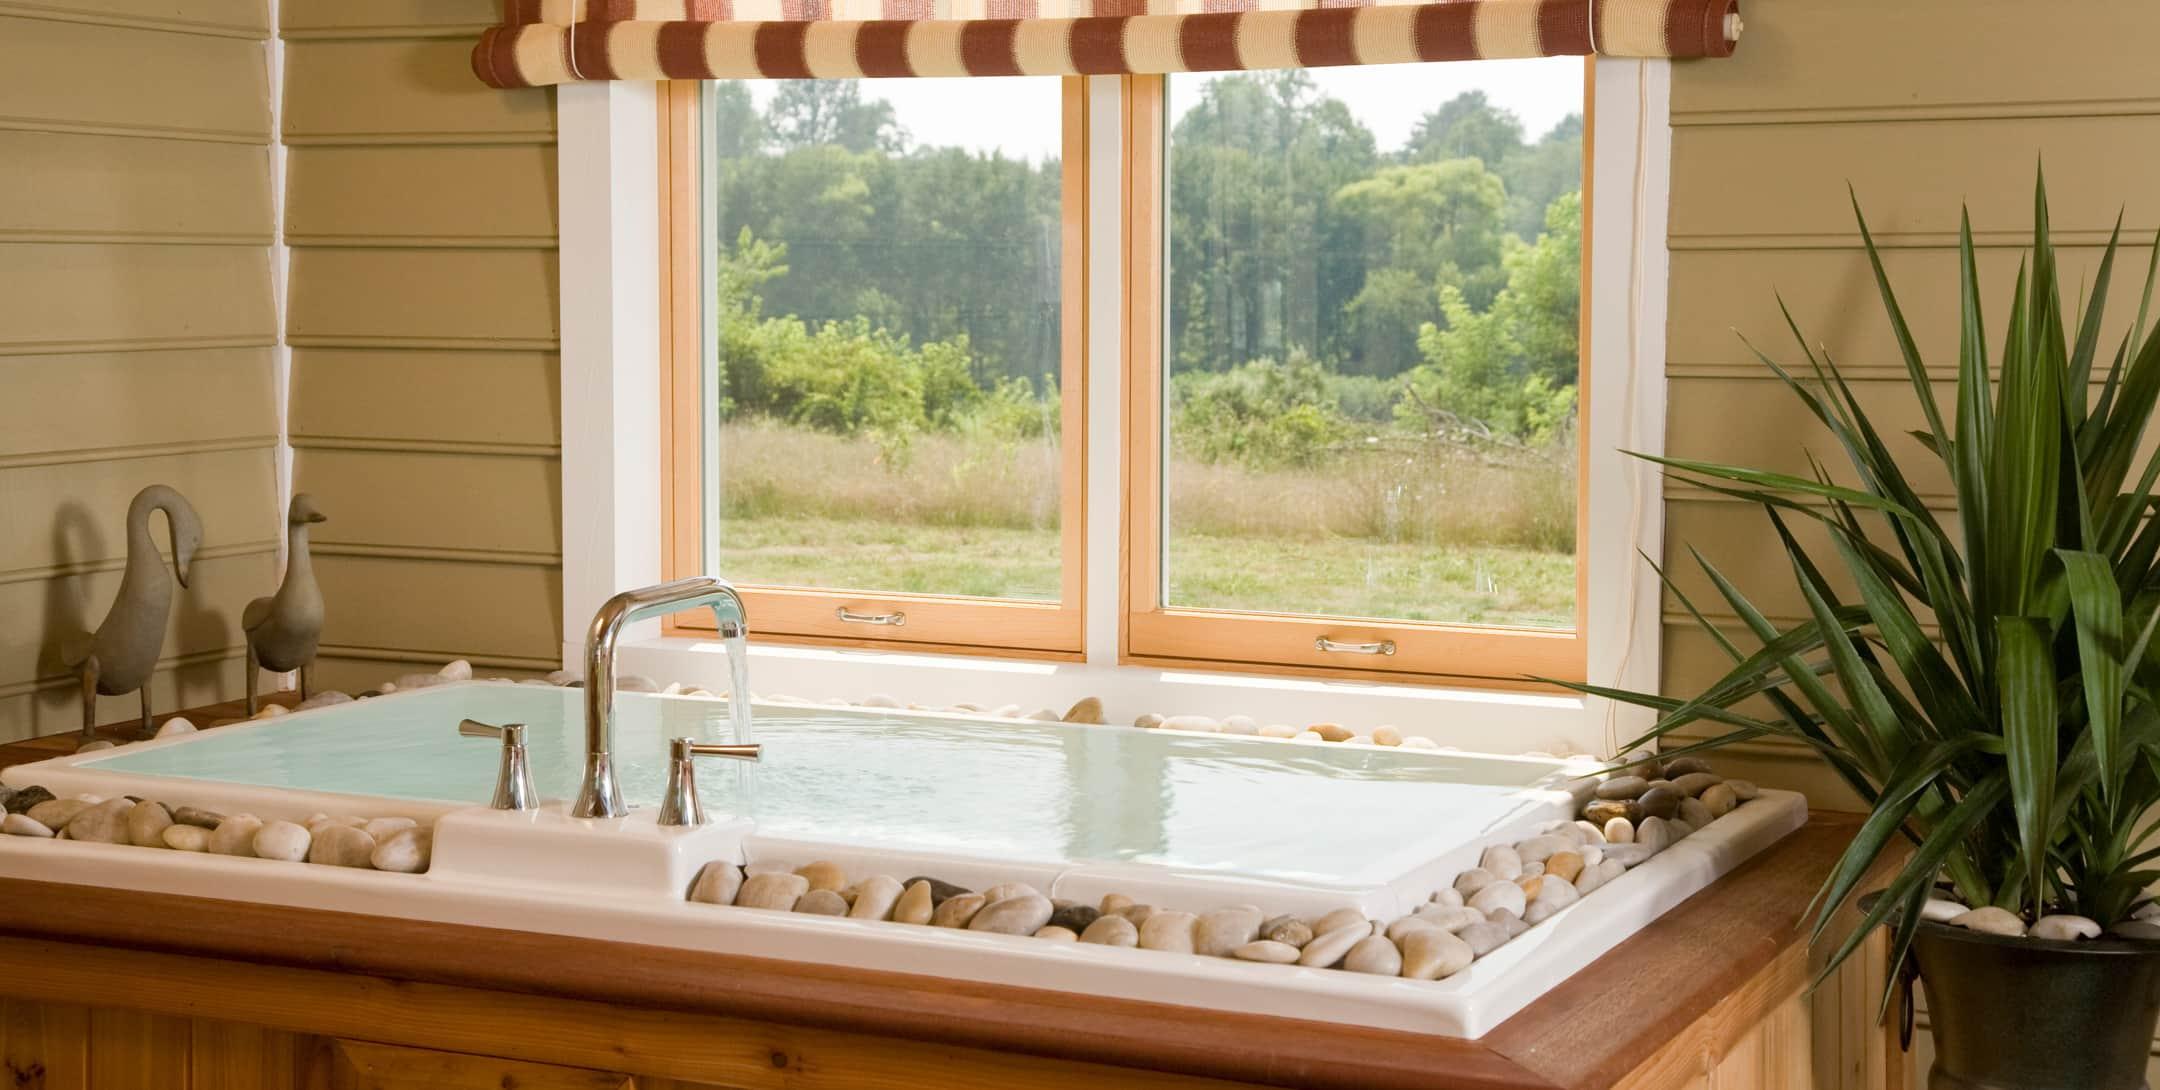 Japanese soaking tub in the Marley's Cottage at Brampton Inn